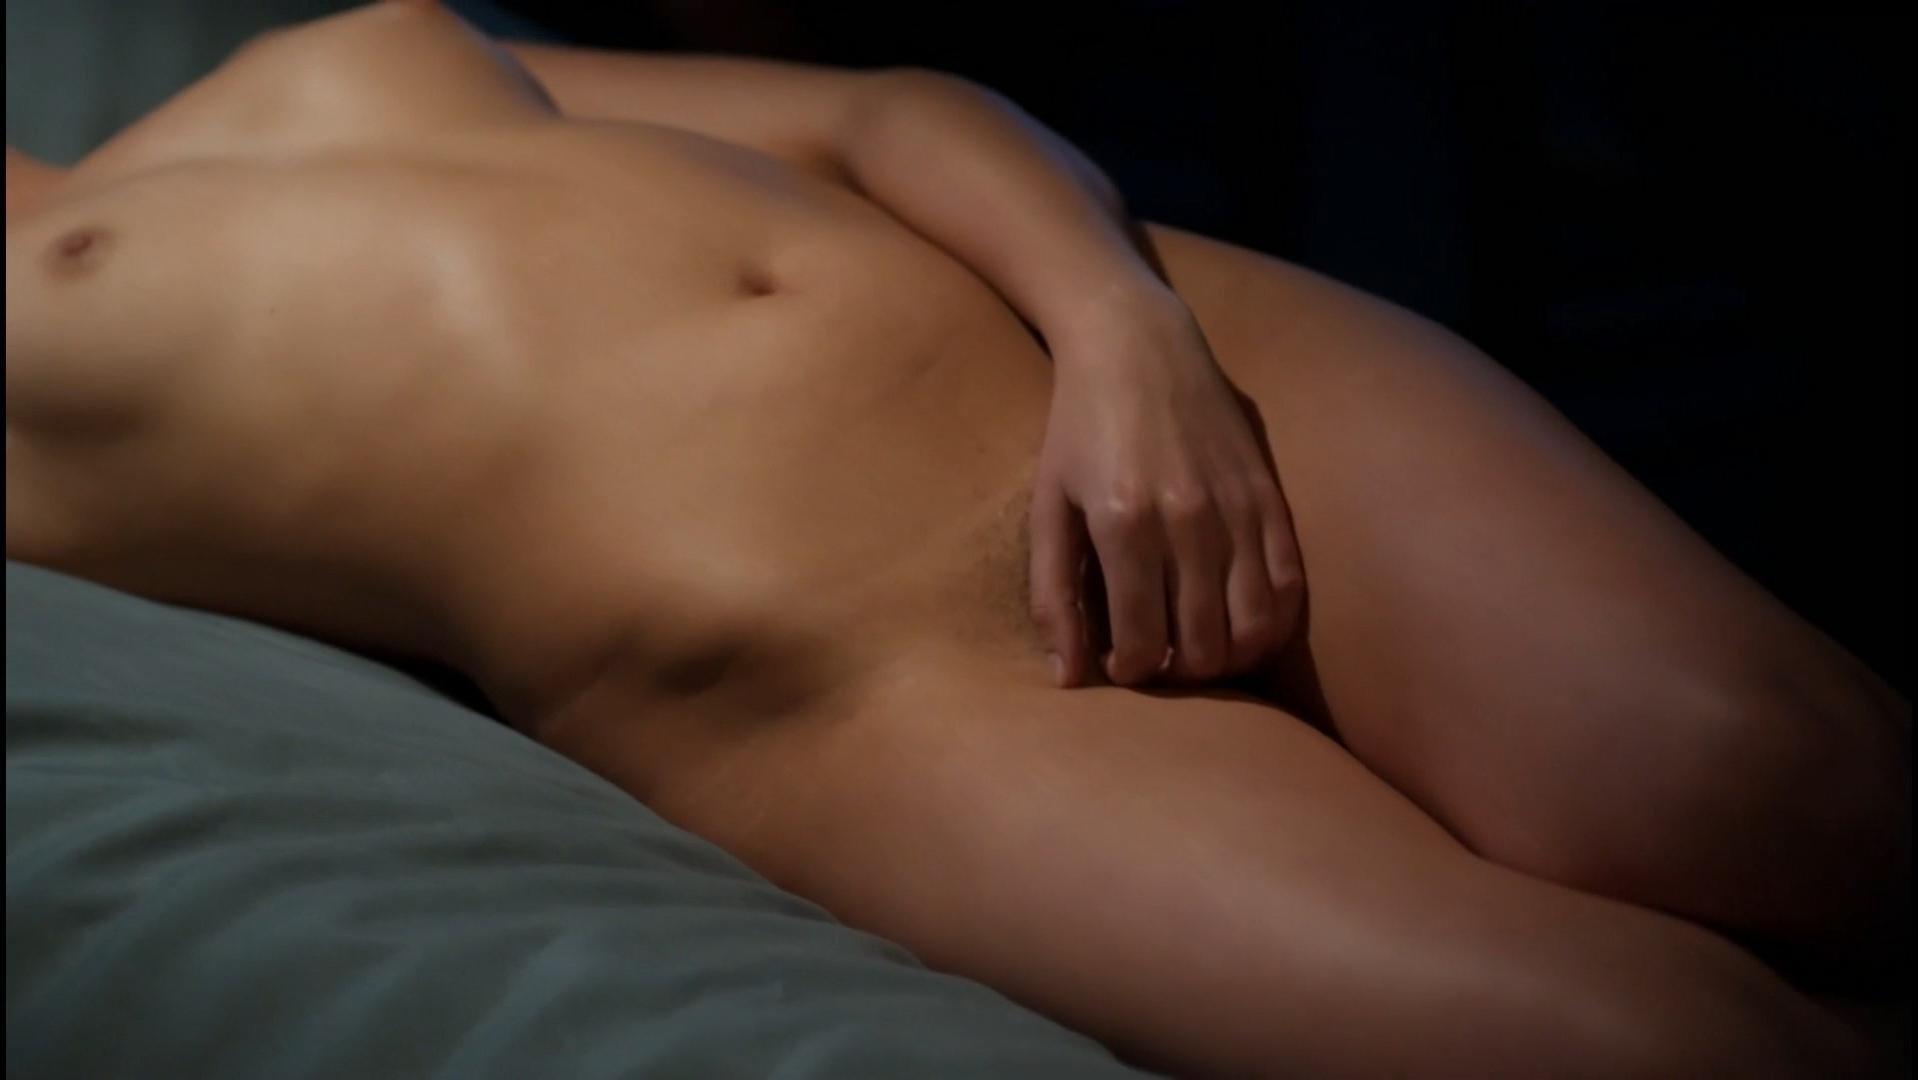 Aleah Nalewick nude - Cherry (2010)